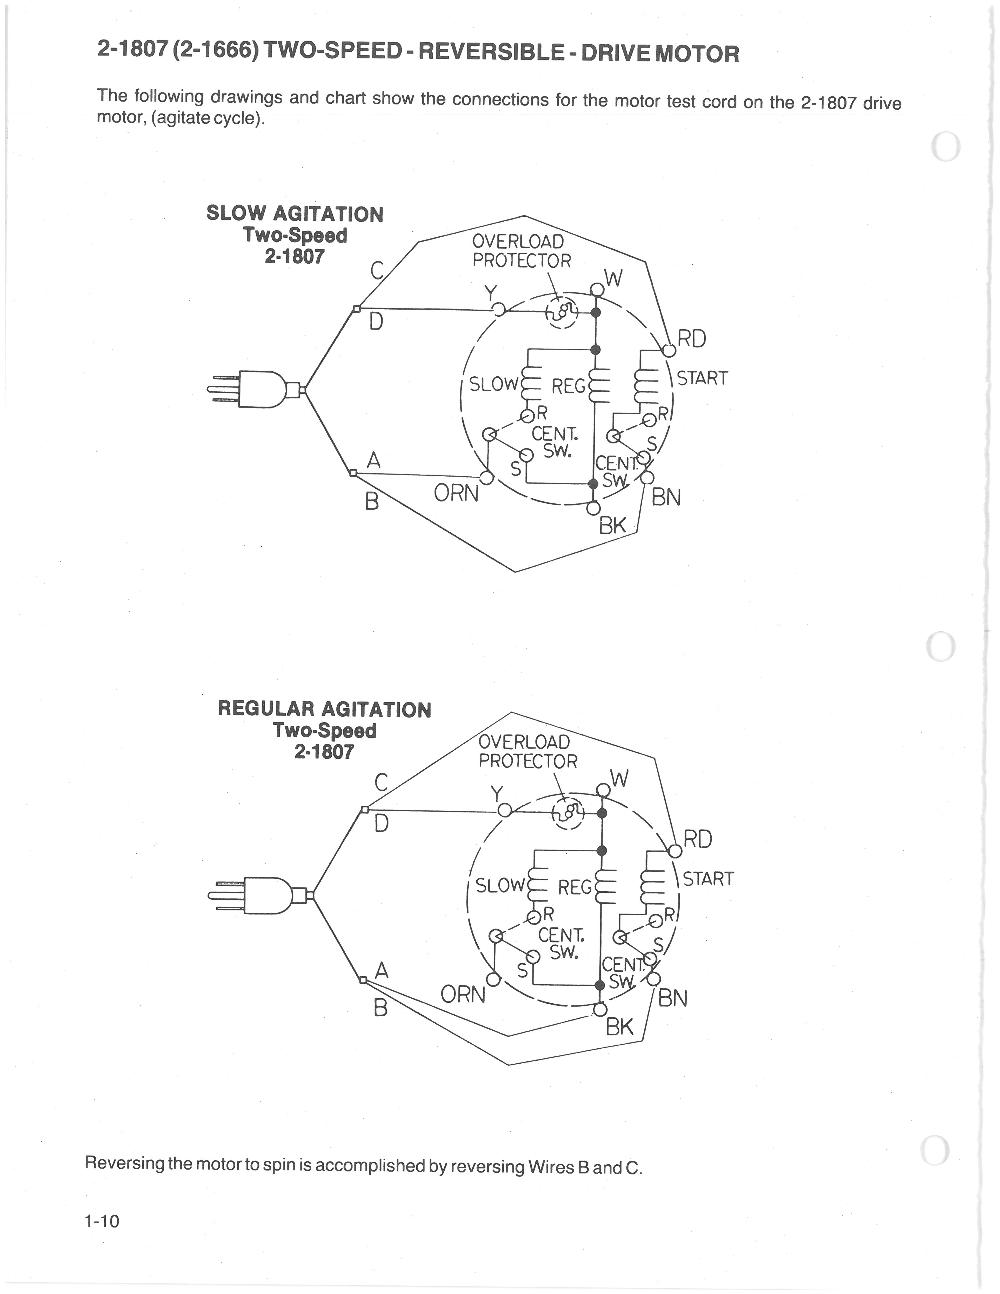 rescue motor wiring diagram testing a 70 s maytag a606 motor  testing a 70 s maytag a606 motor